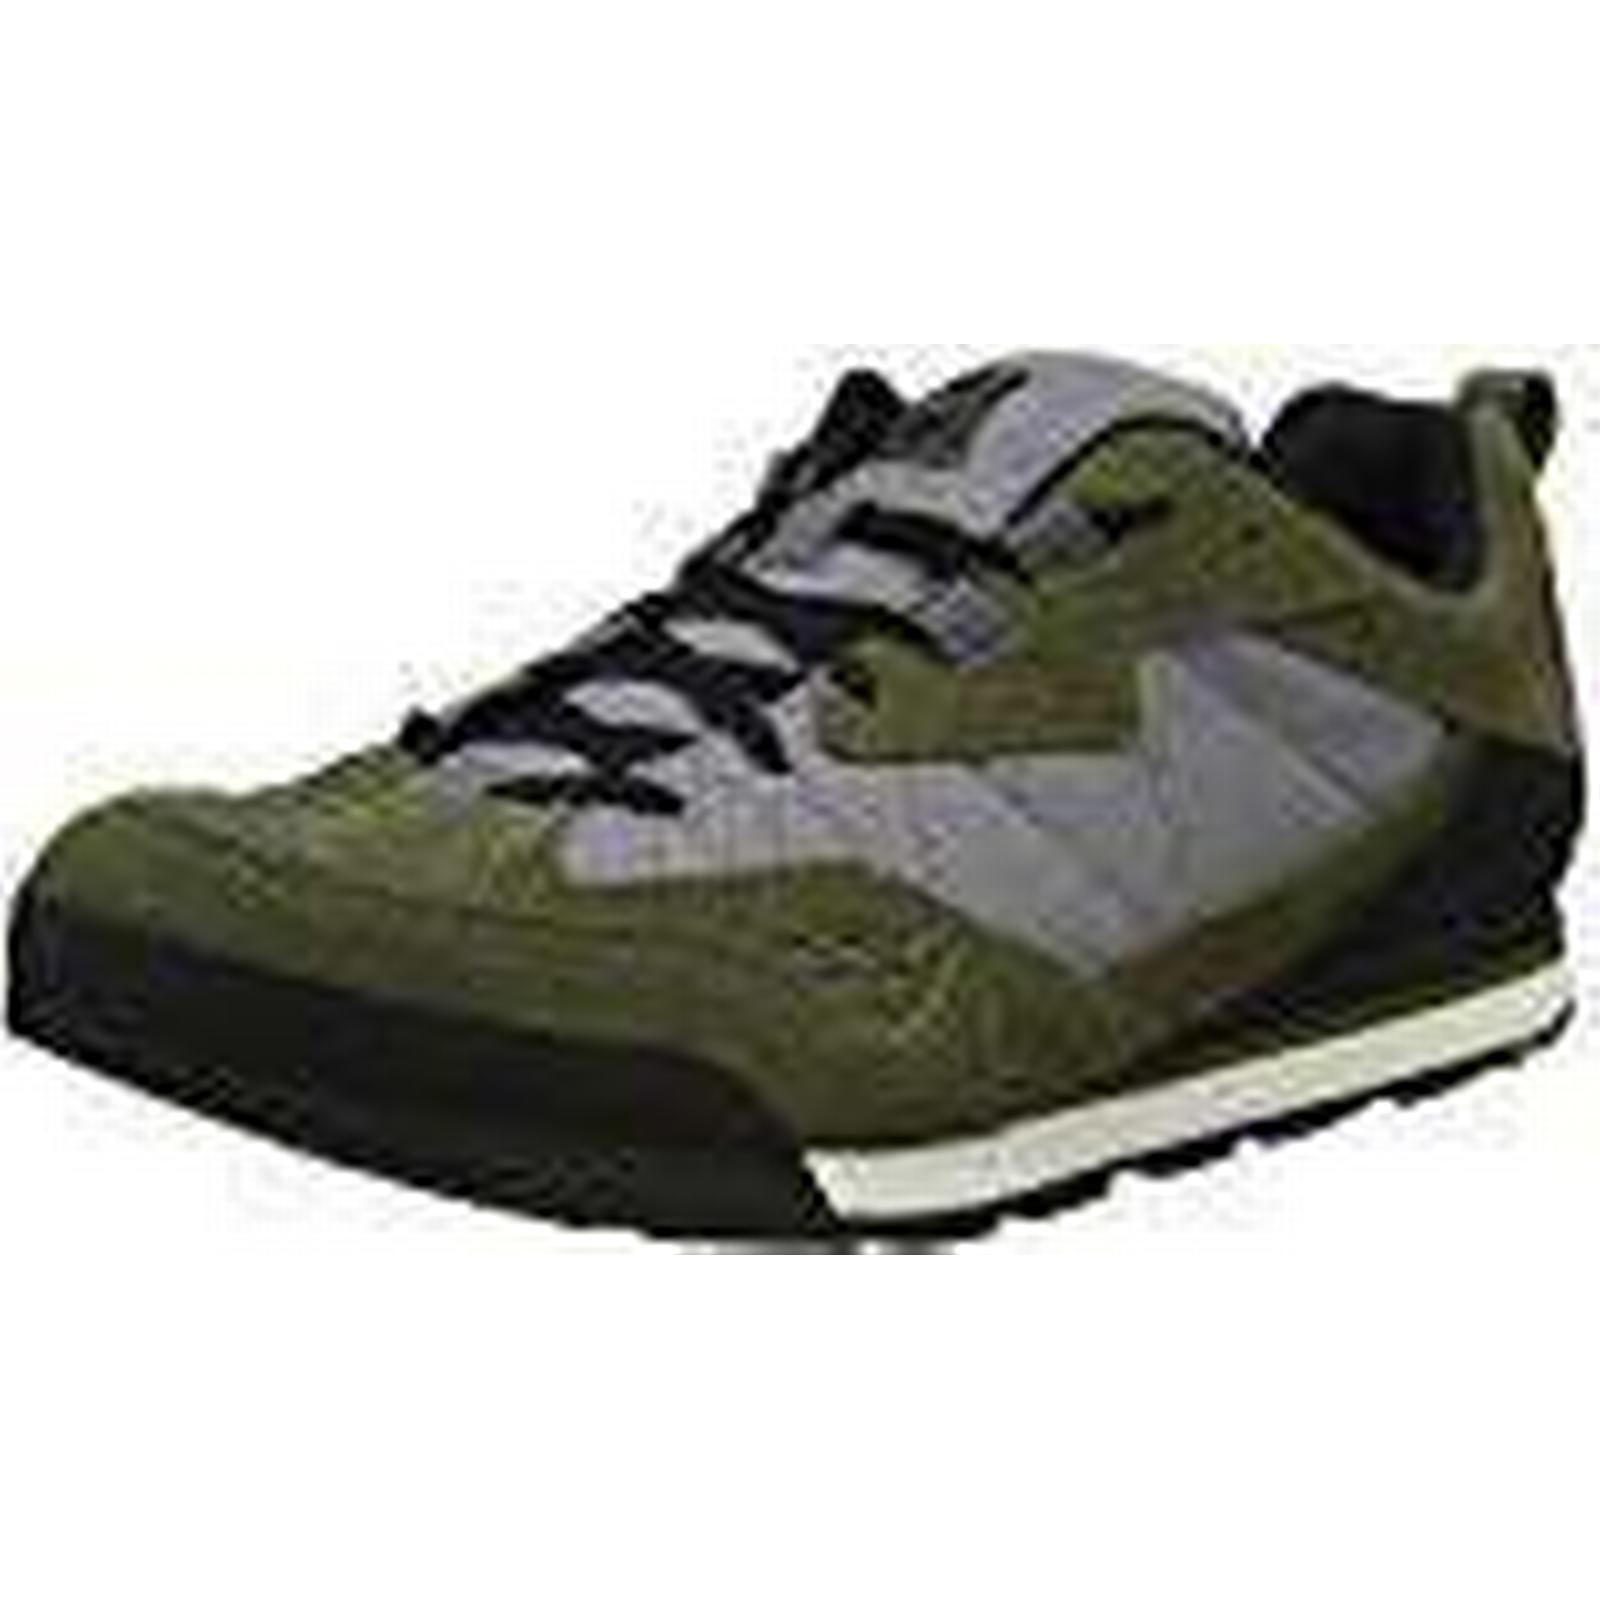 Merrell Men's Burnt Rock Green Tura Denim Low Trainers, Green Rock Dusty Olive/Gry, 11.5 (46.5 EU) d09940